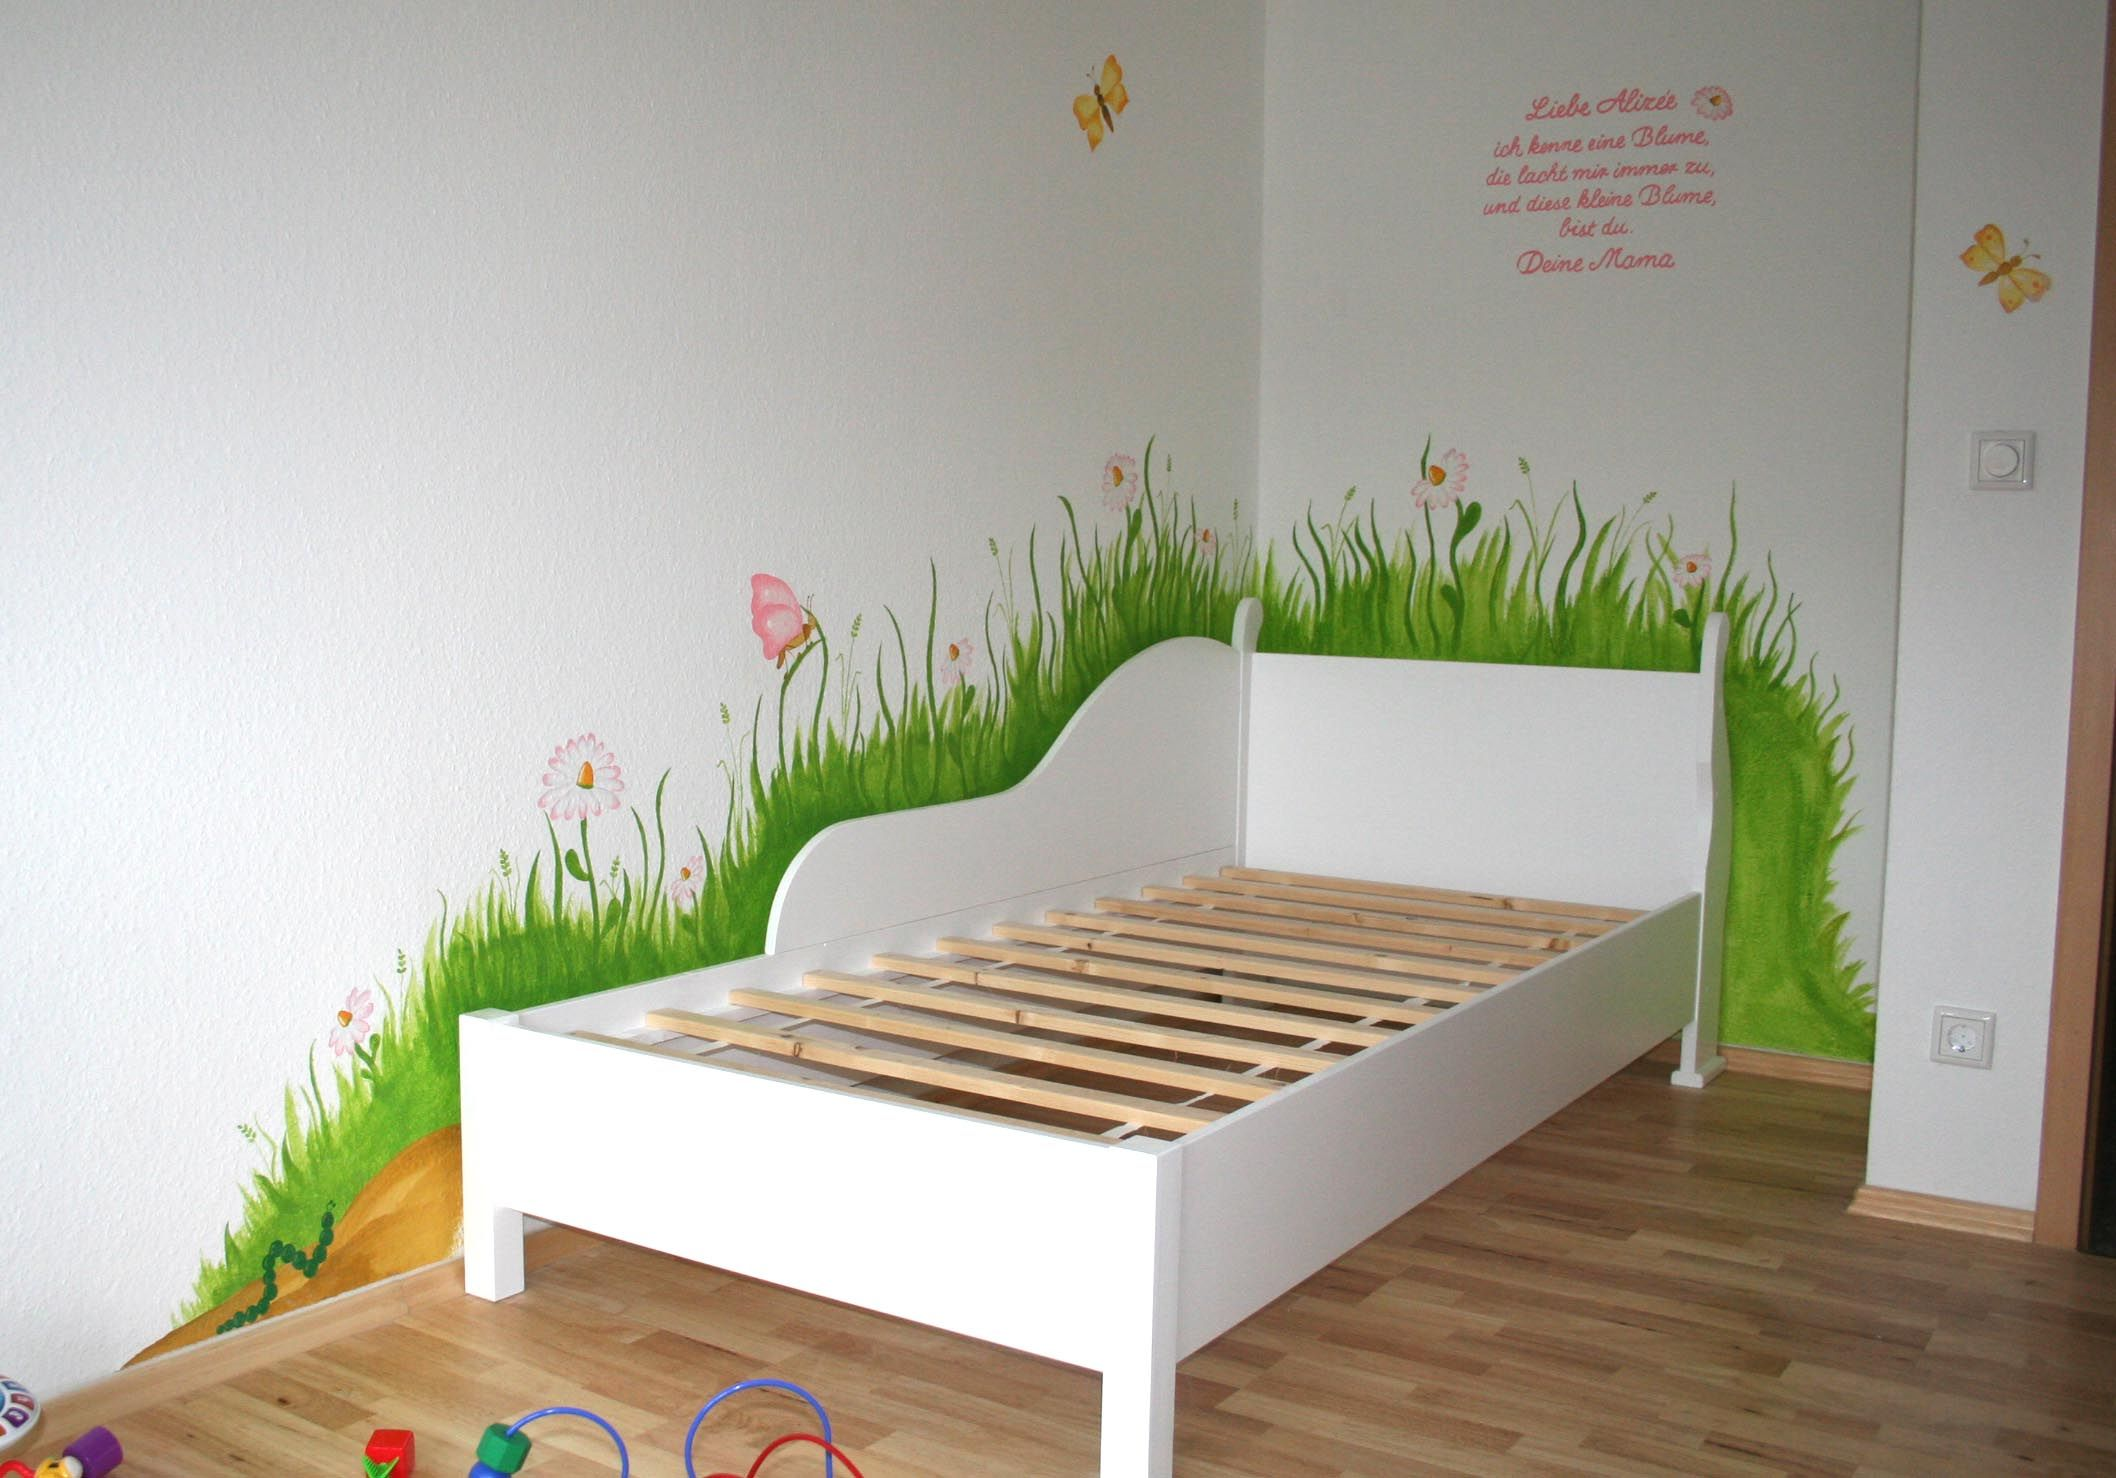 wandmalerei auf pinterest stra enk nstler street art graffiti und graffitik nstler. Black Bedroom Furniture Sets. Home Design Ideas